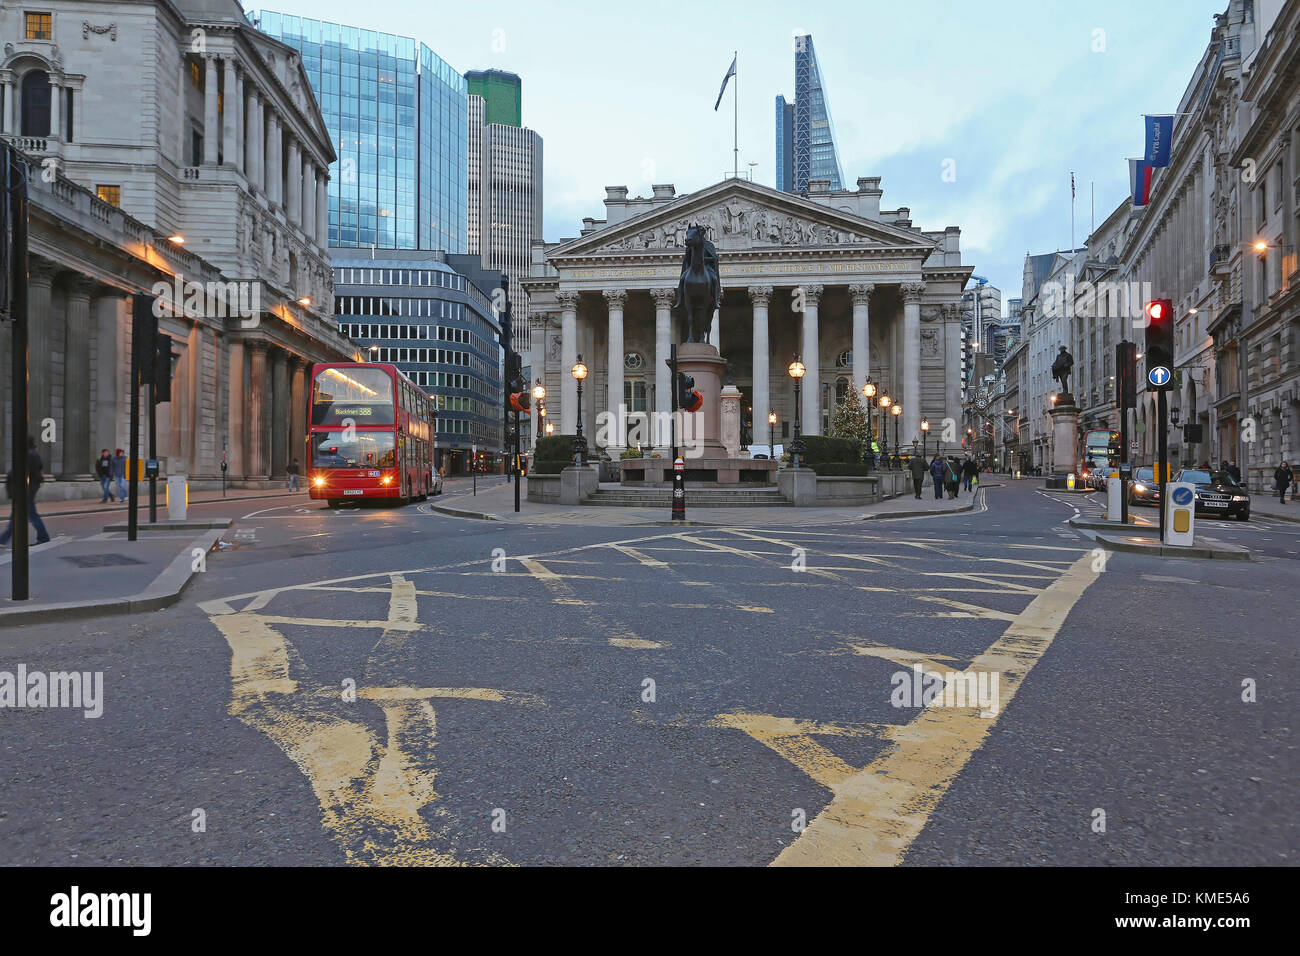 LONDON, UNITED KINGDOM - NOVEMBER 23: The Royal Exchange in London on NOVEMBER 23, 2013. Historic Building of Royal - Stock Image